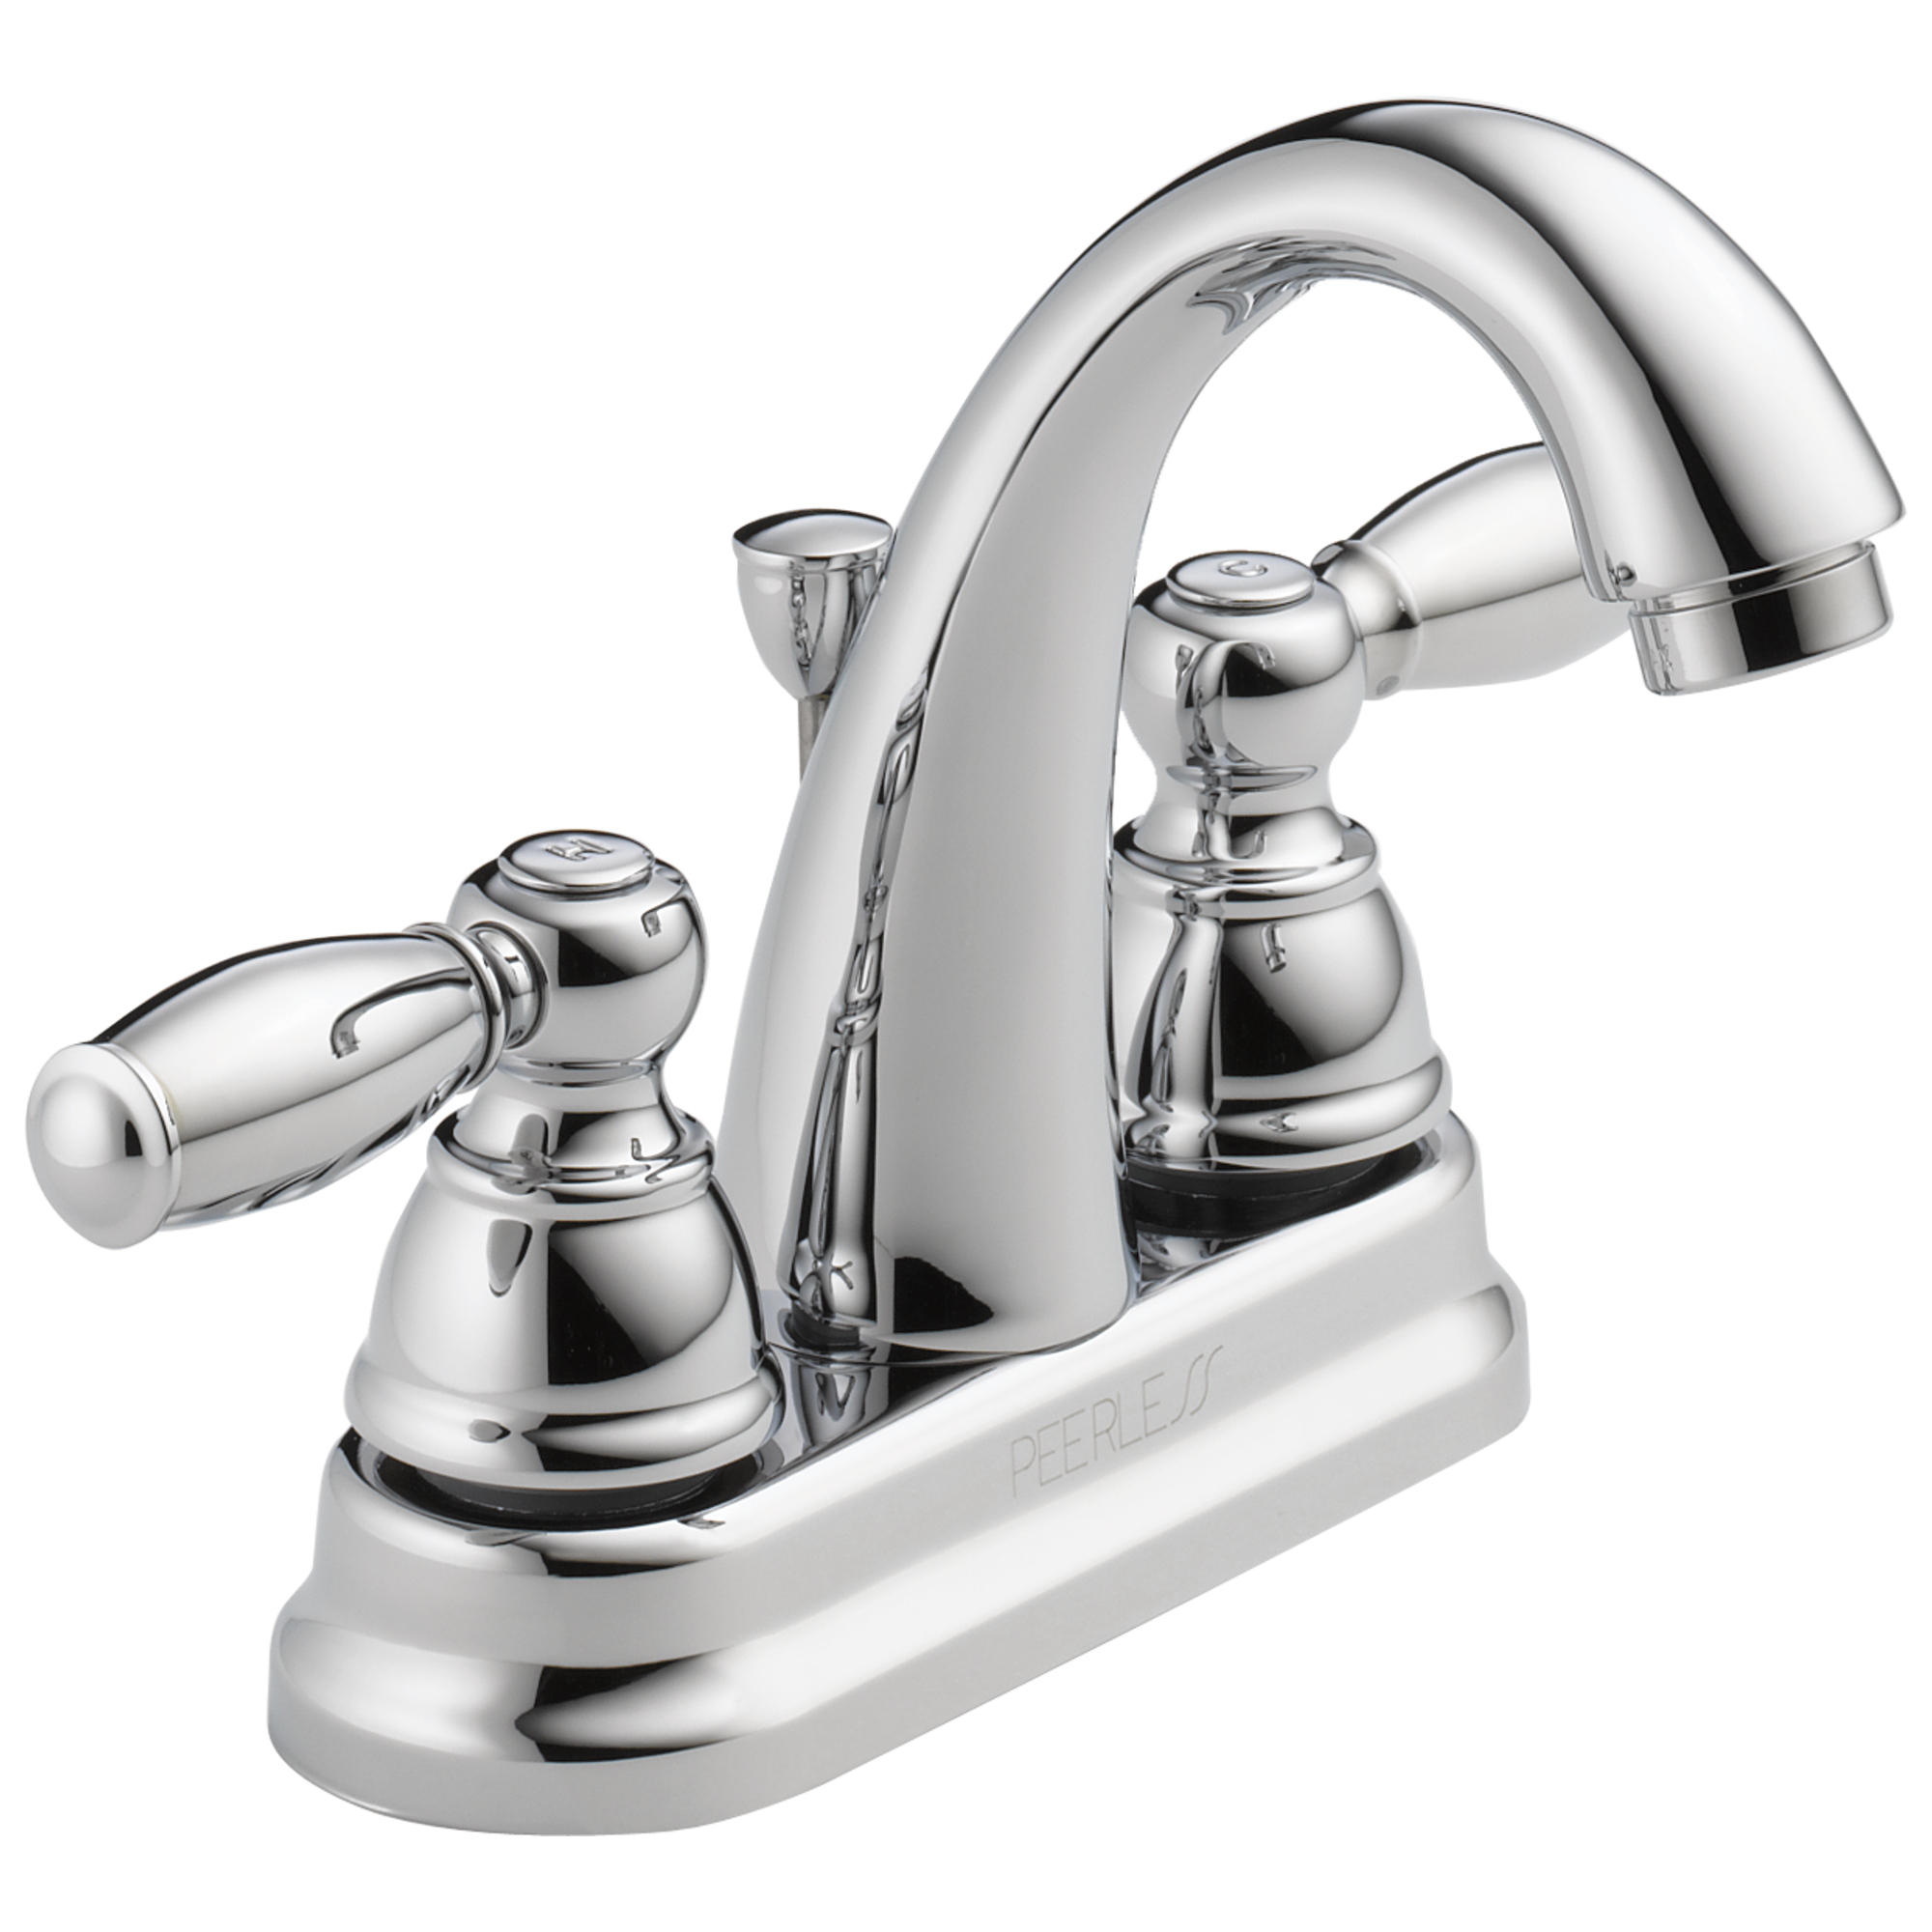 P299696LF - Two Handle Bathroom Faucet